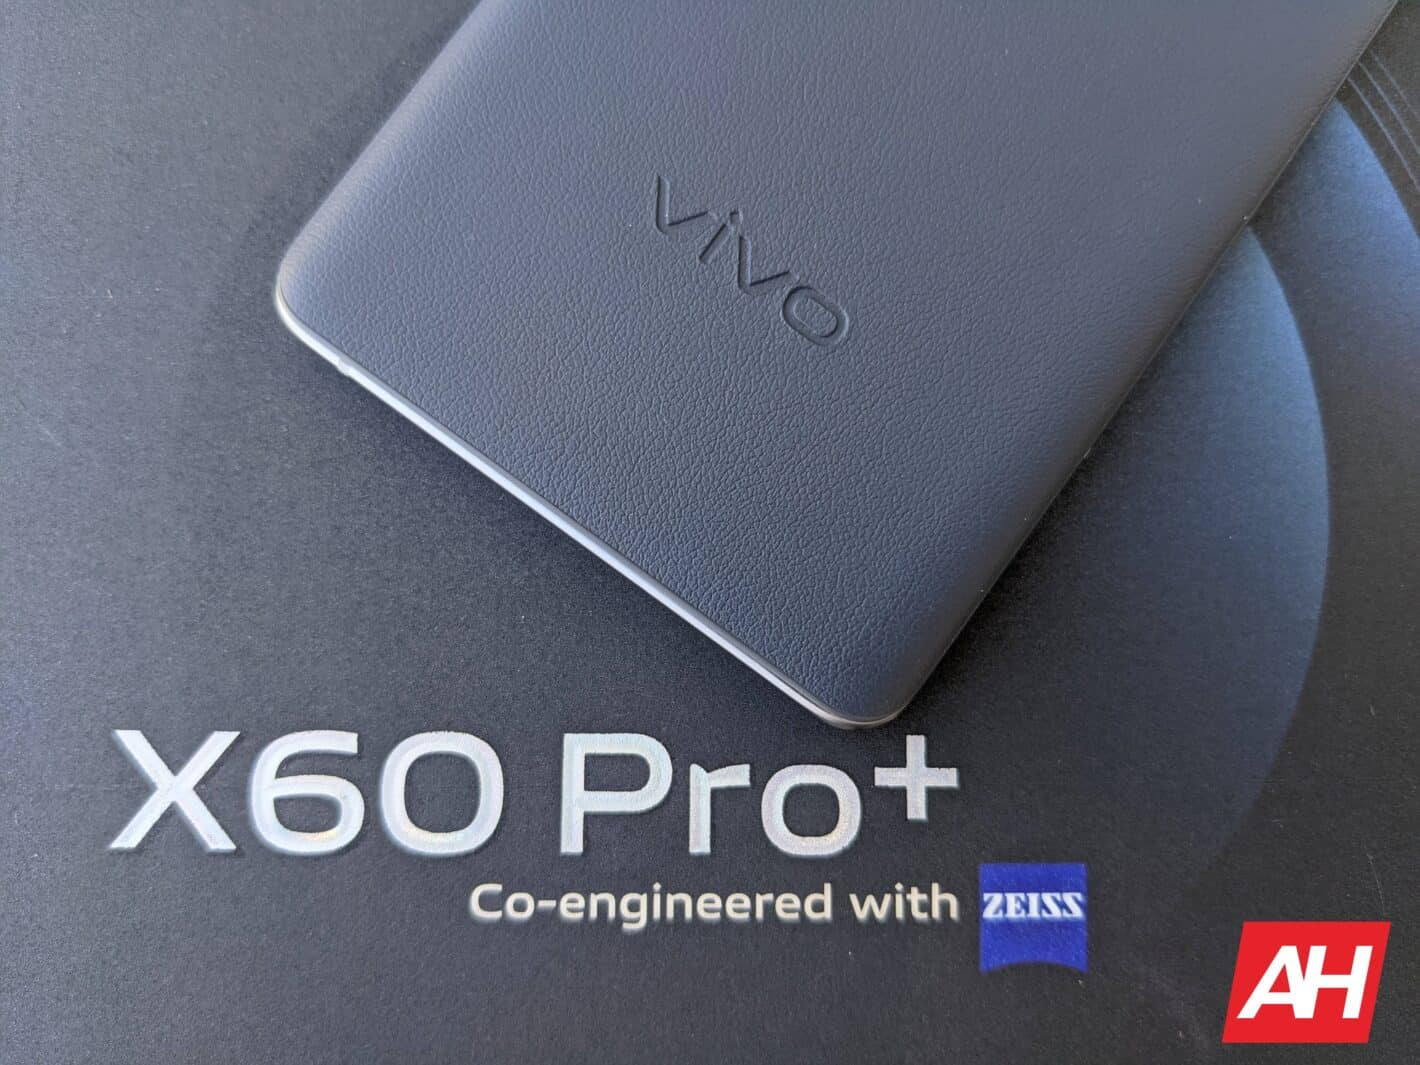 Vivo X60 Pro AH HR HW9